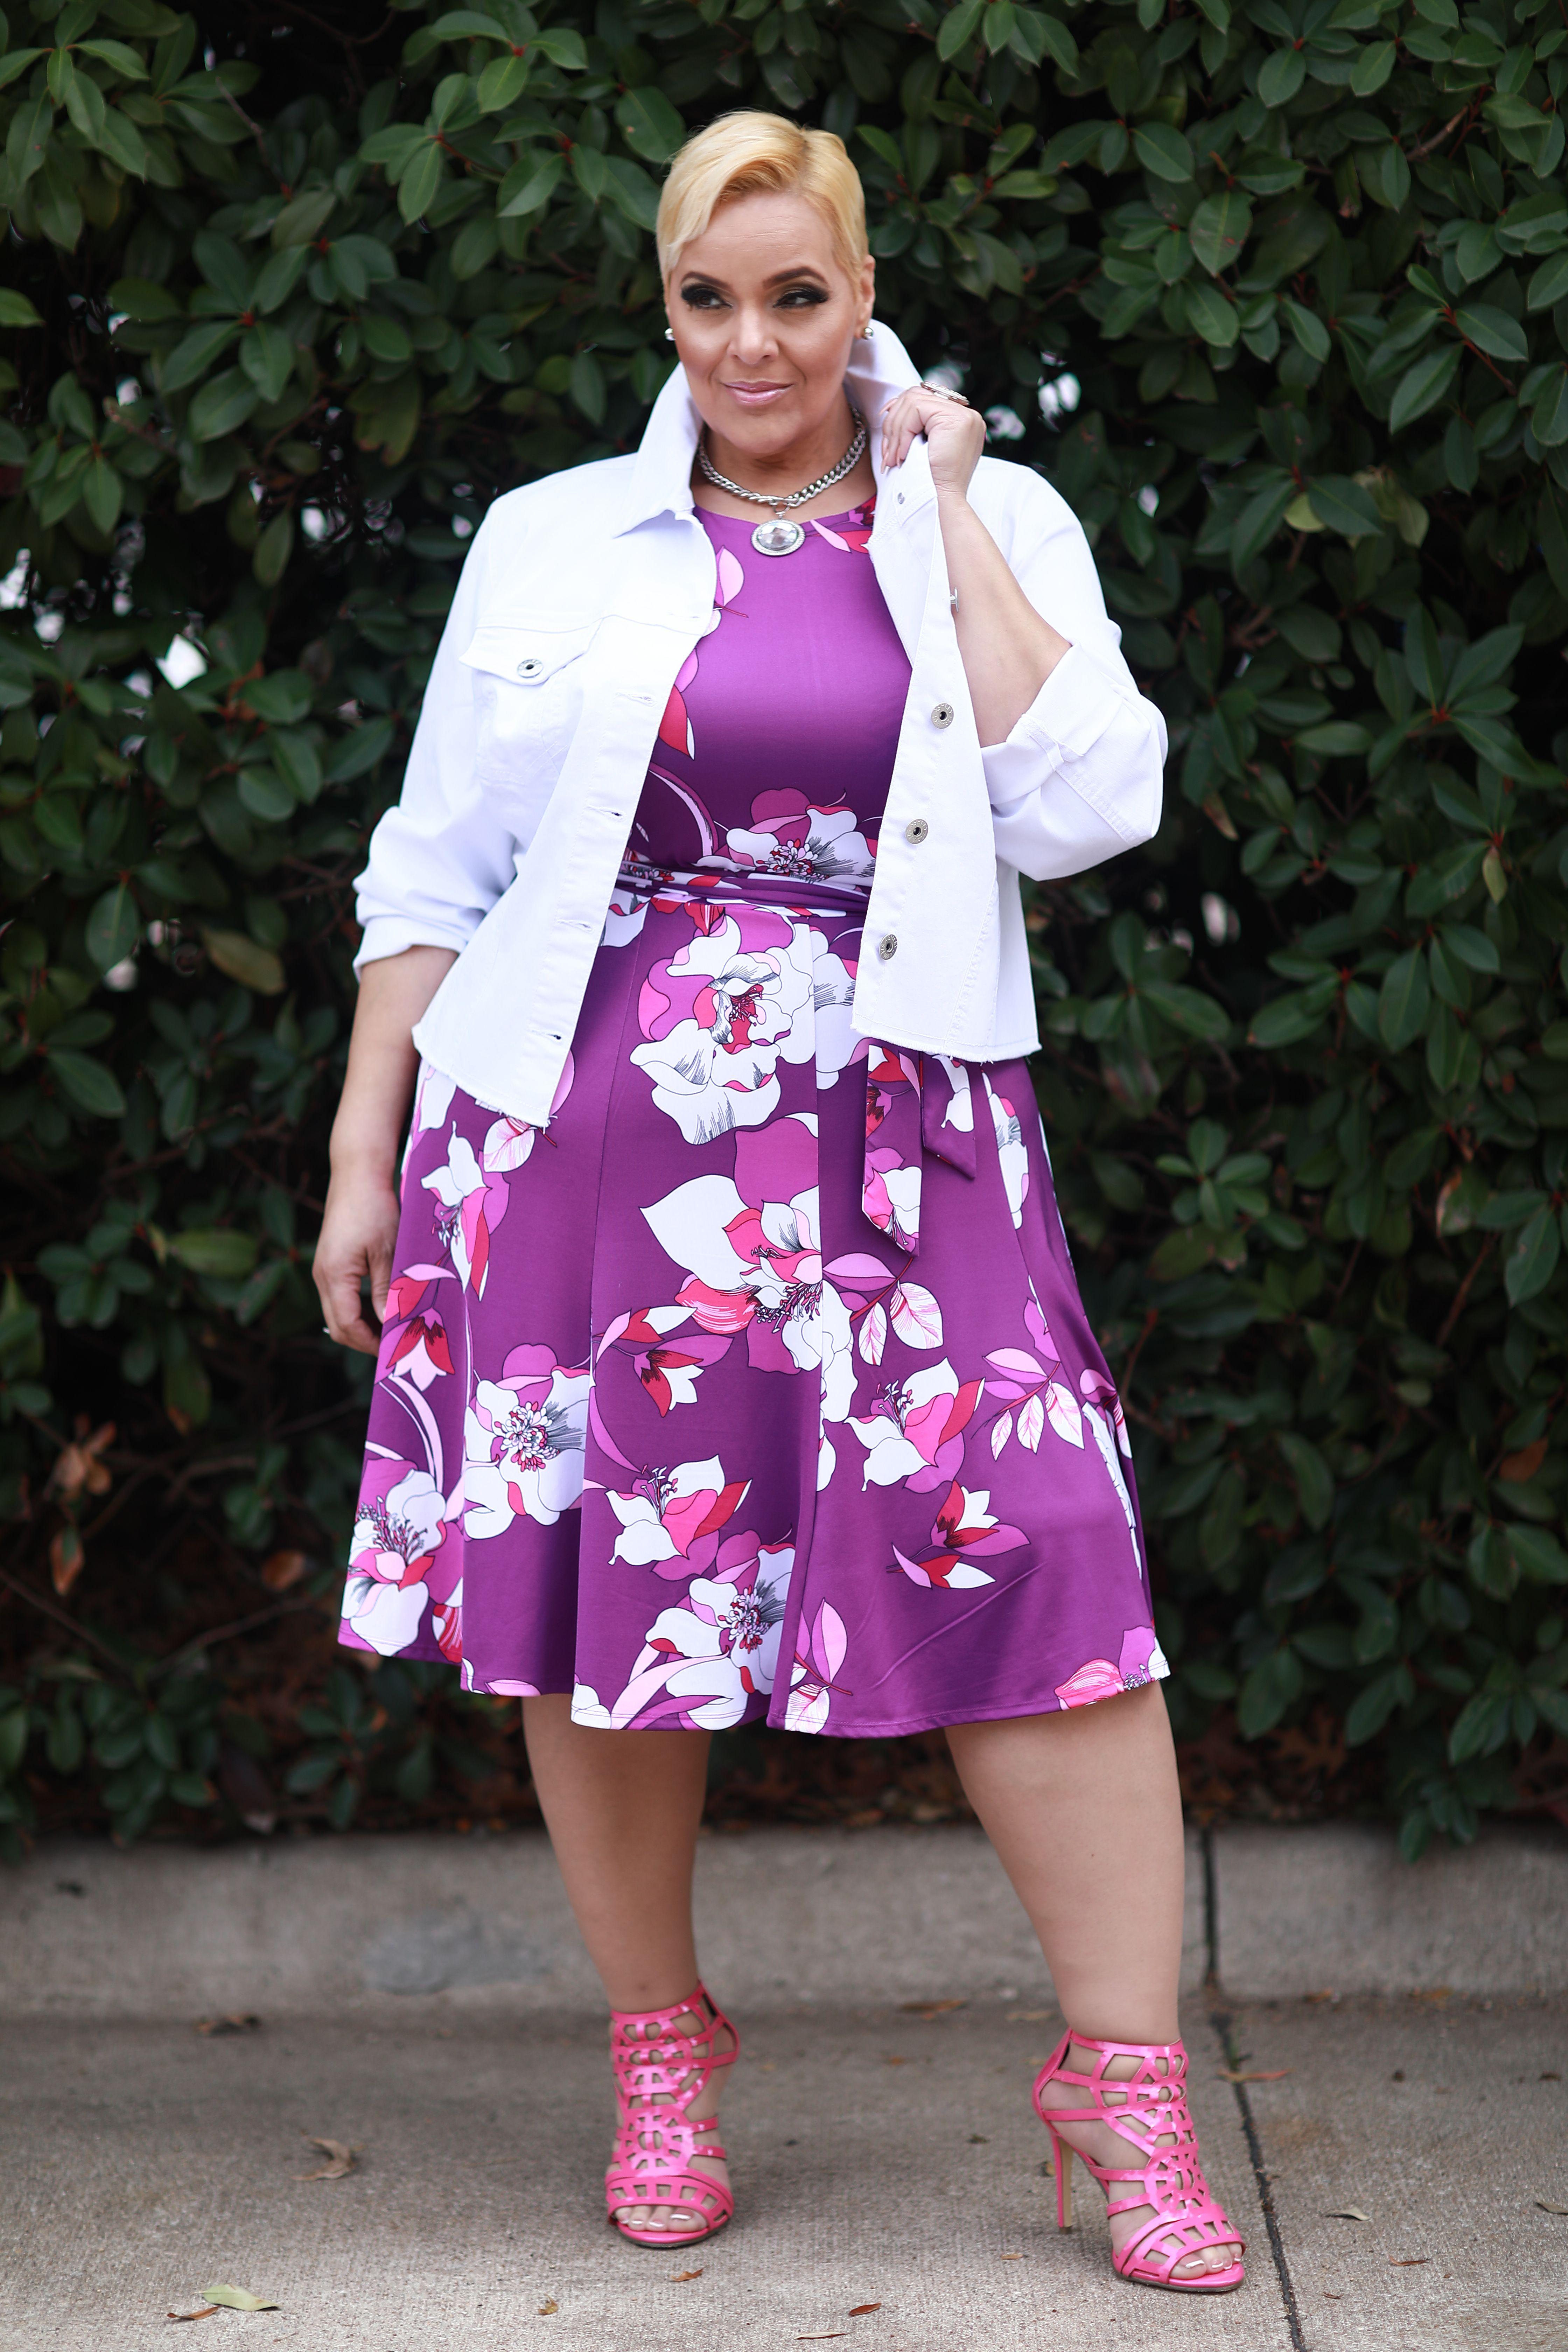 Pin de Patricia Calhoun en I would so wear this outfit! | Pinterest ...